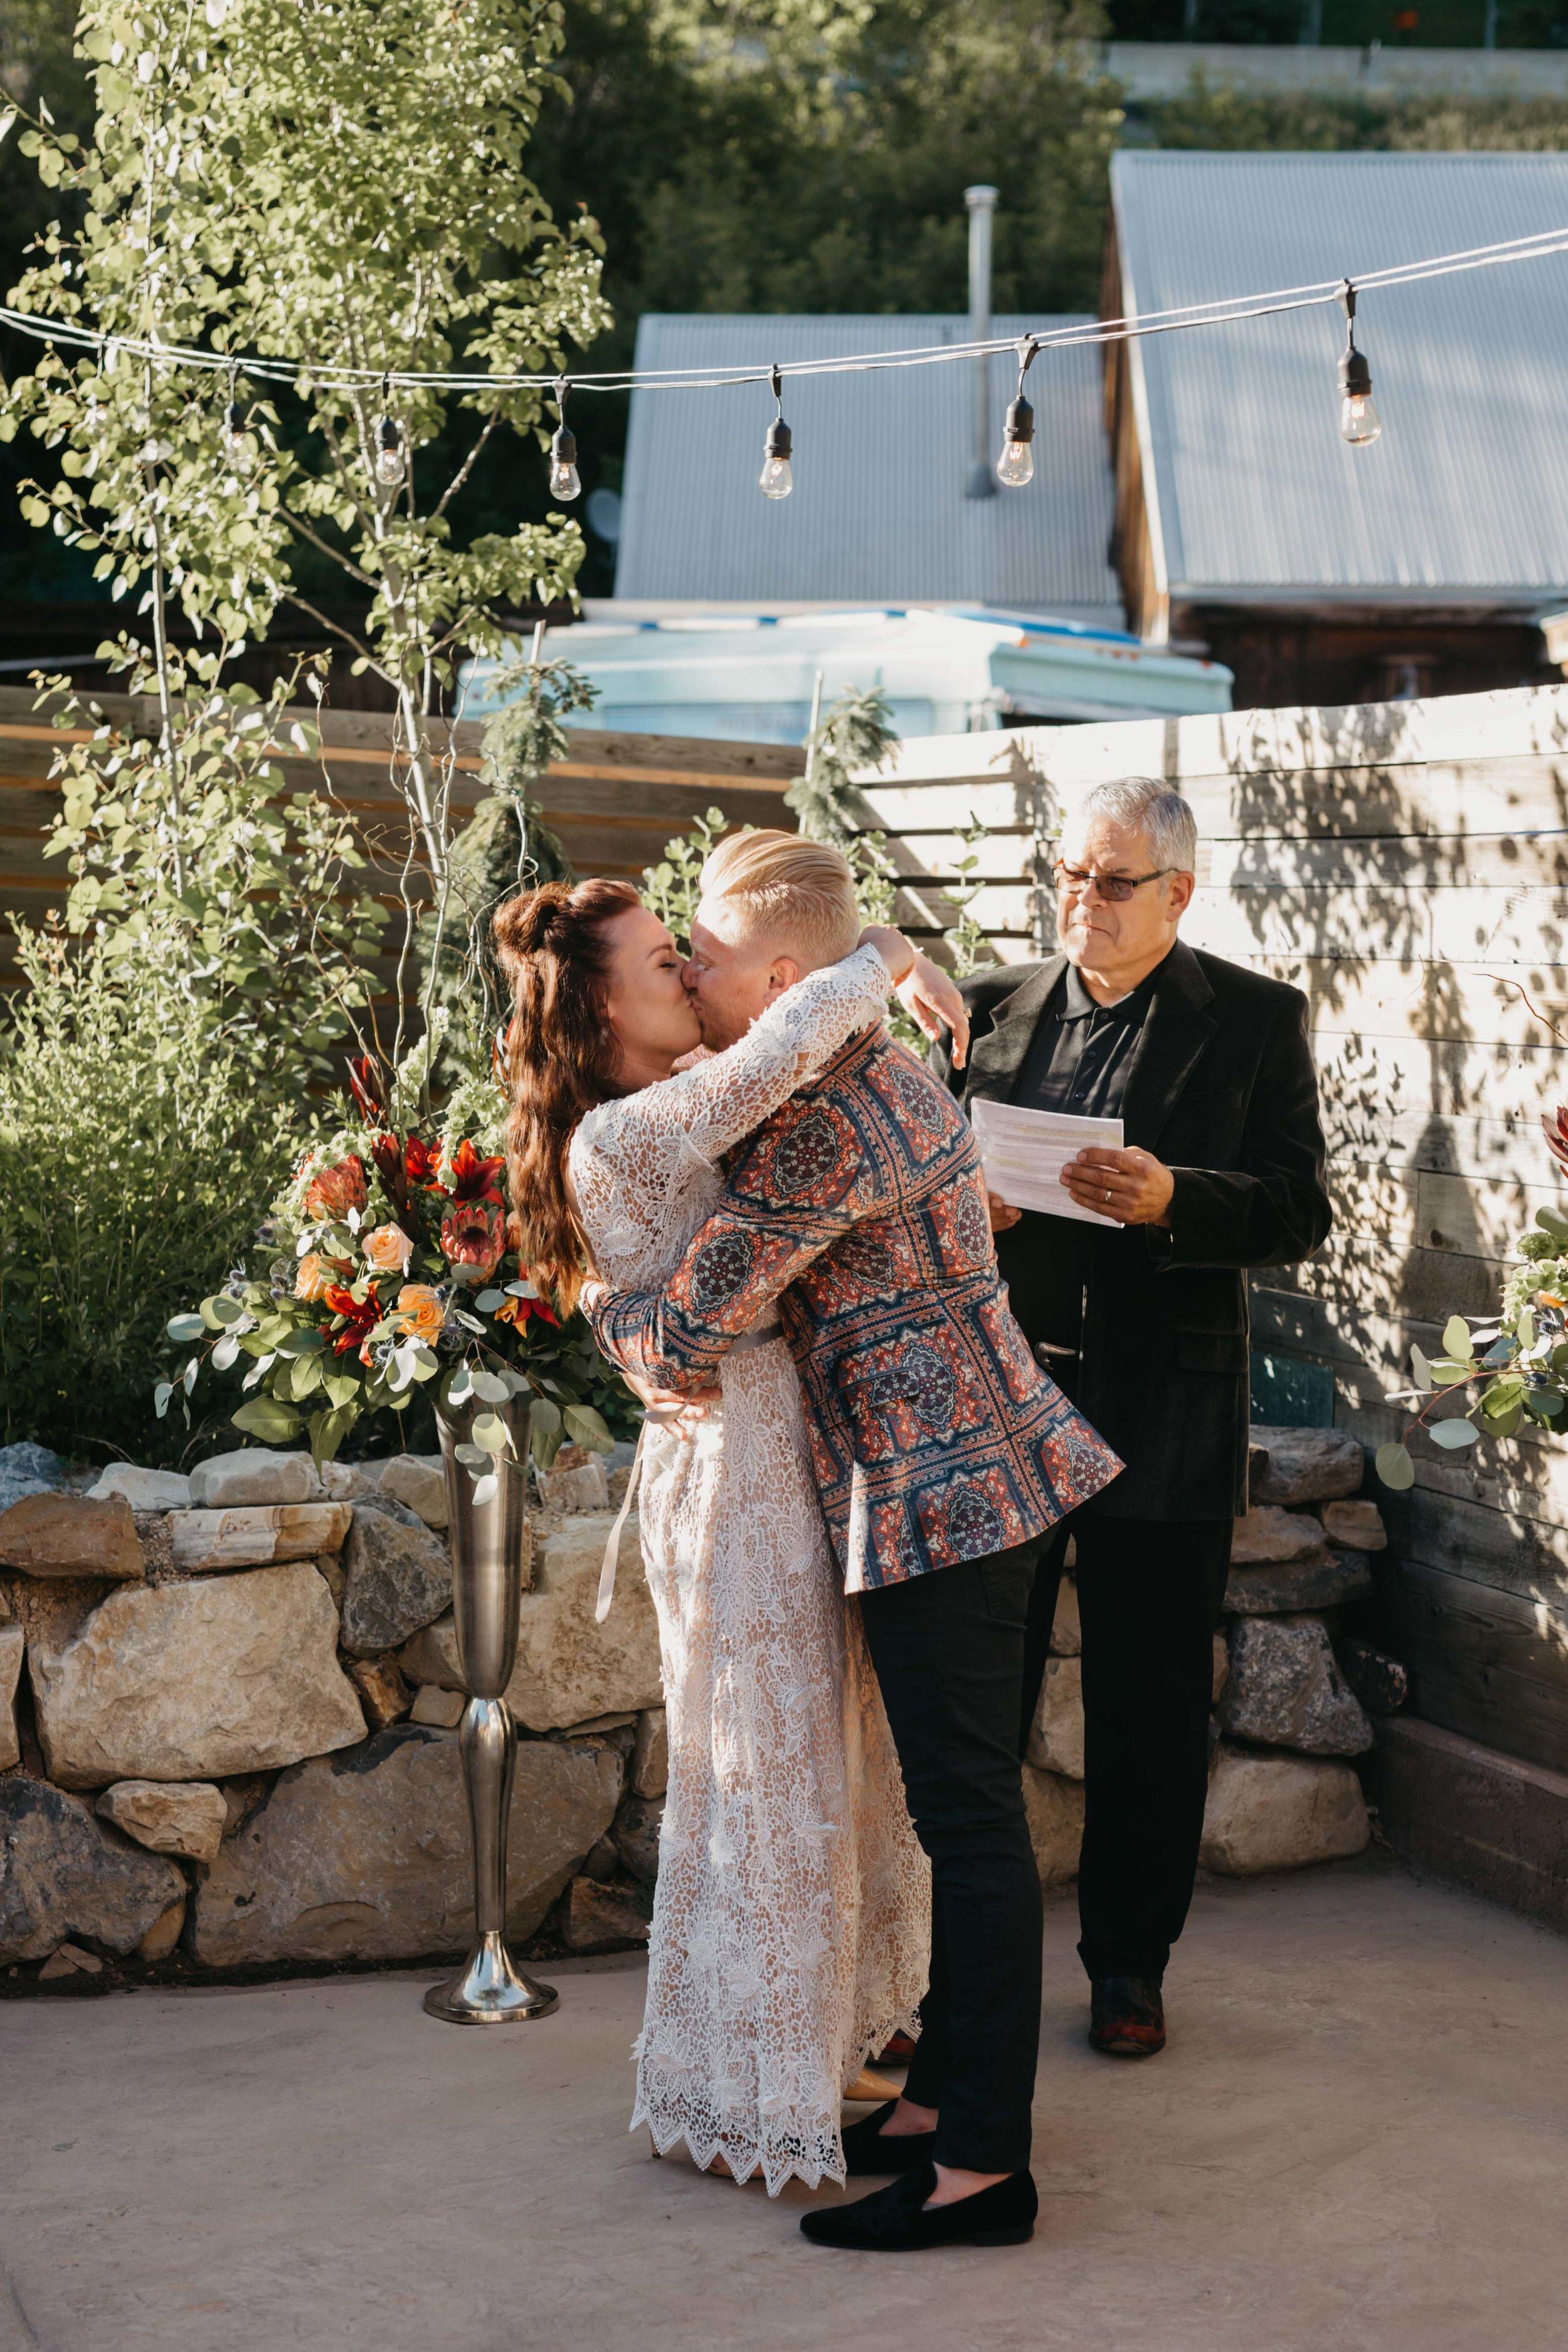 Utah-Wedding-Utah-Photographer-58.jpg